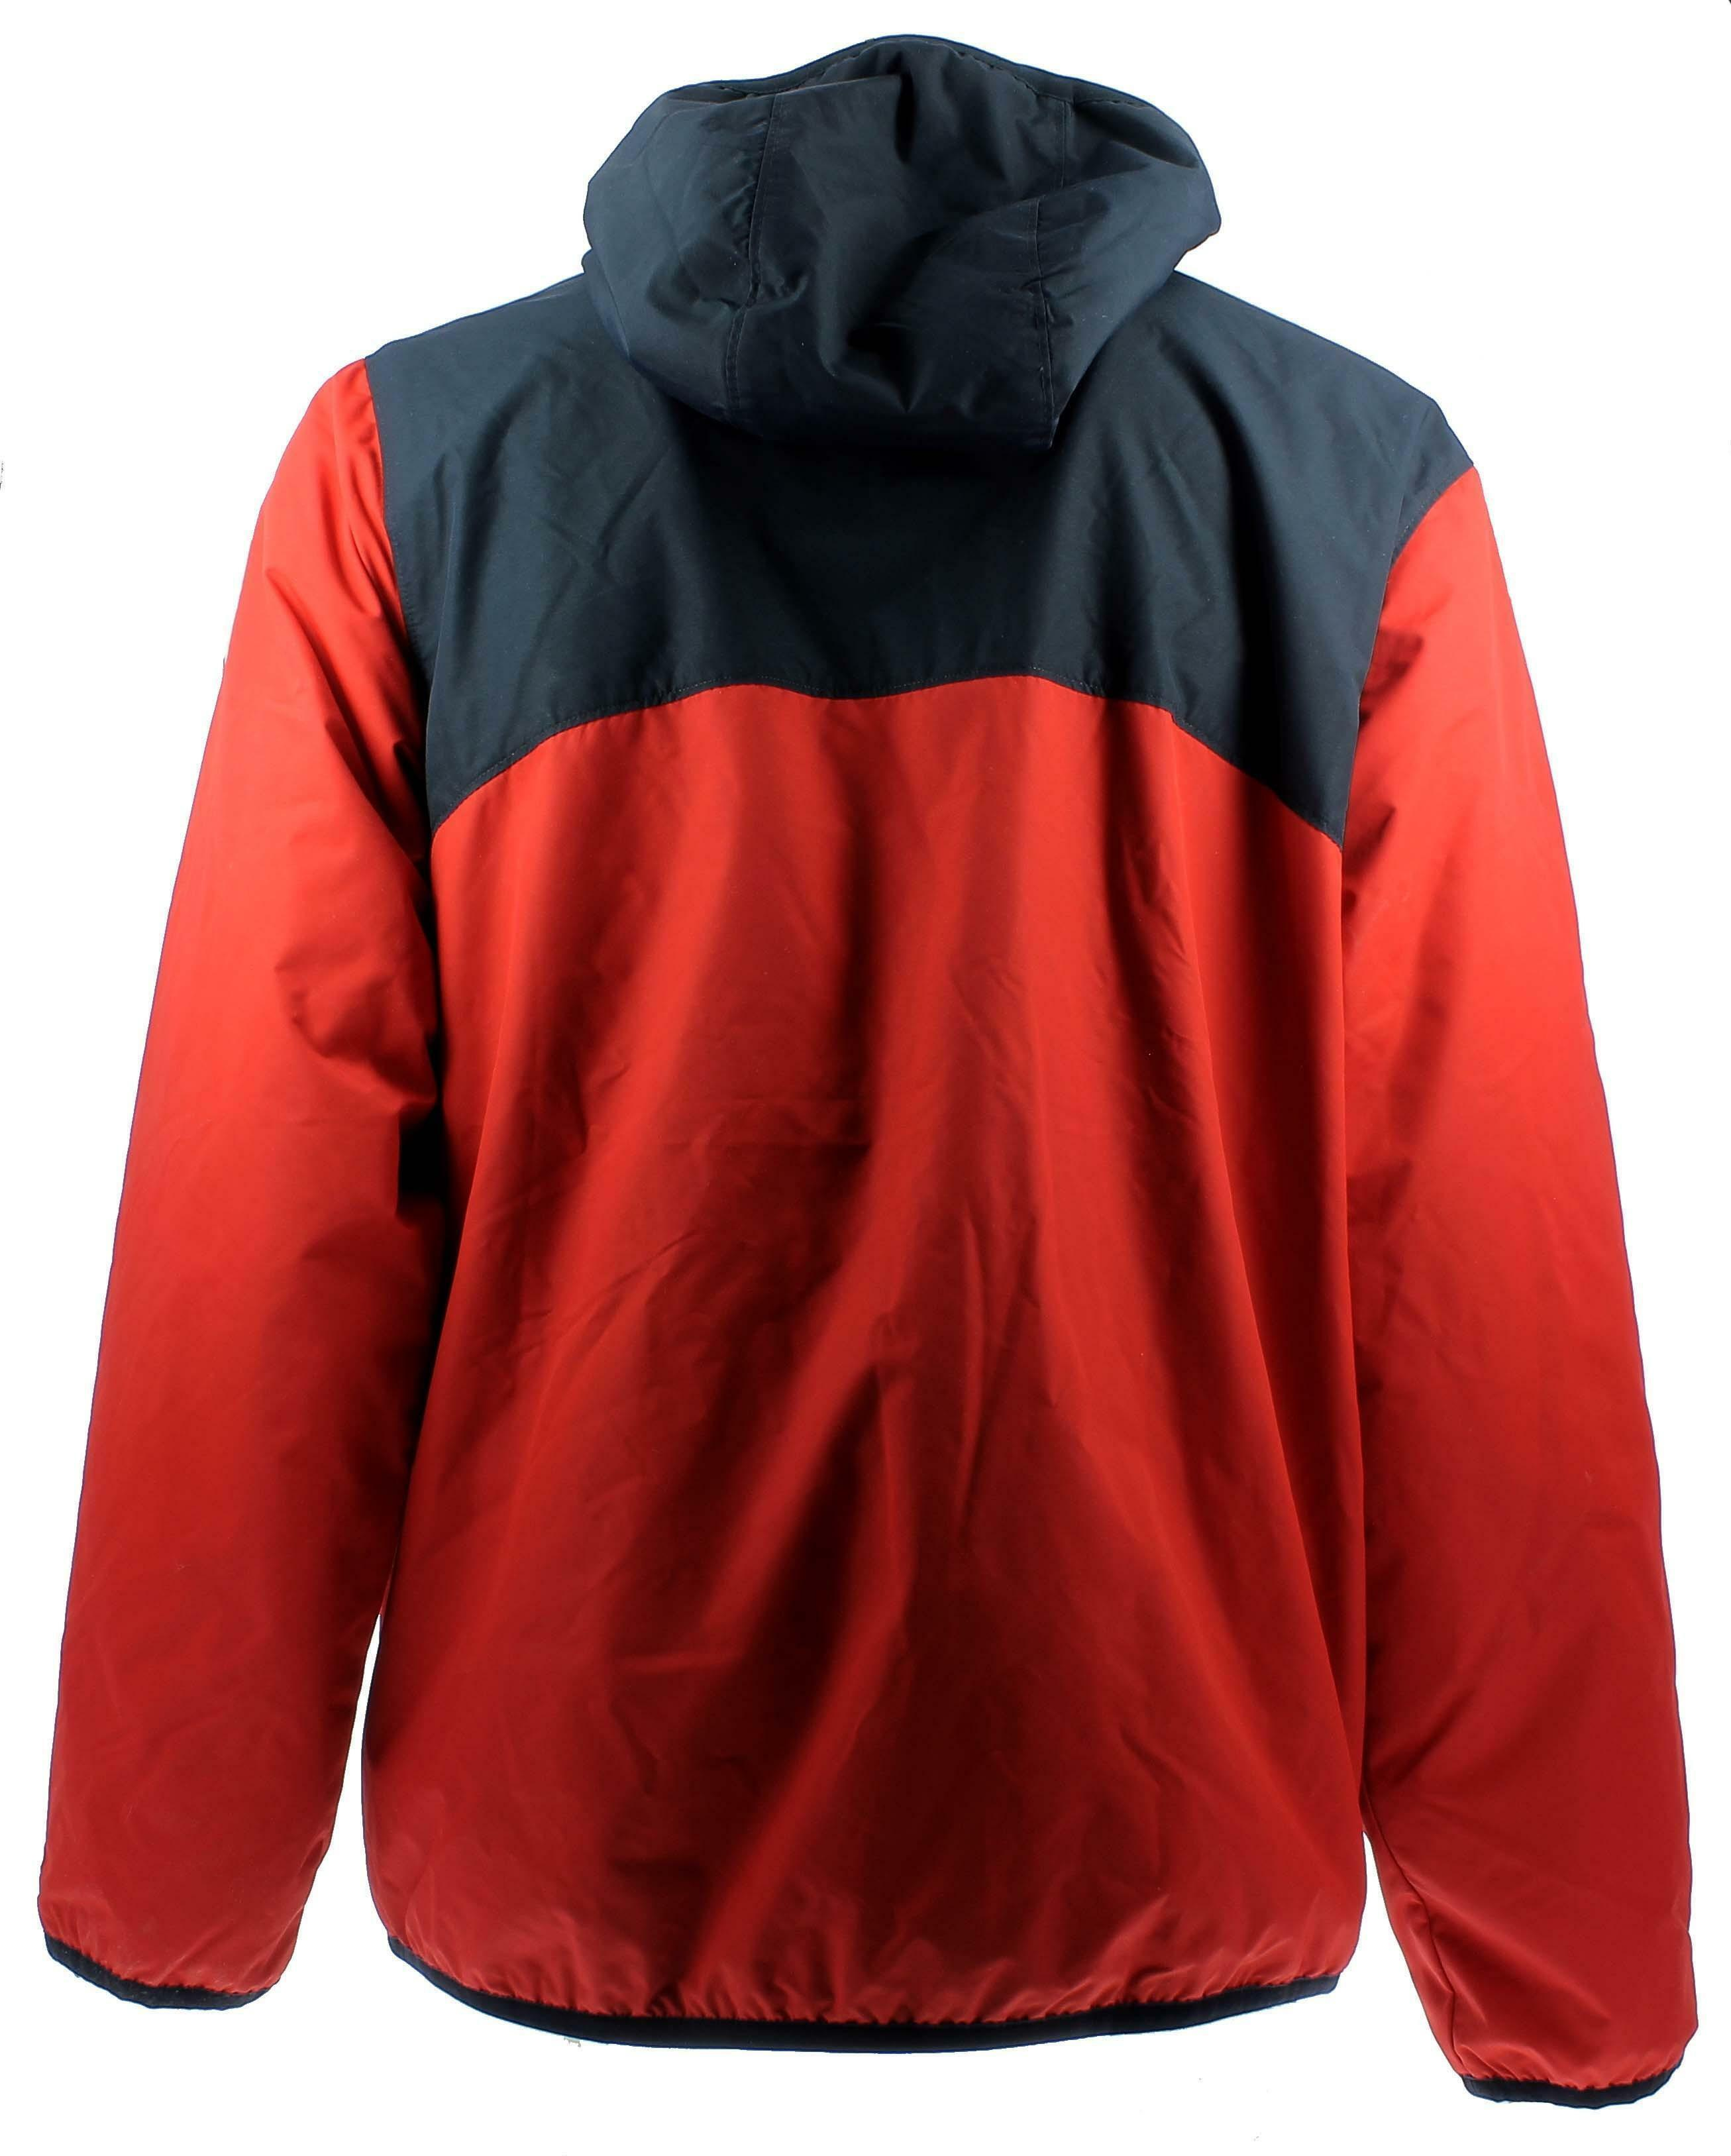 nike nike flece lined jacket giubbino termico uomo rosso blu